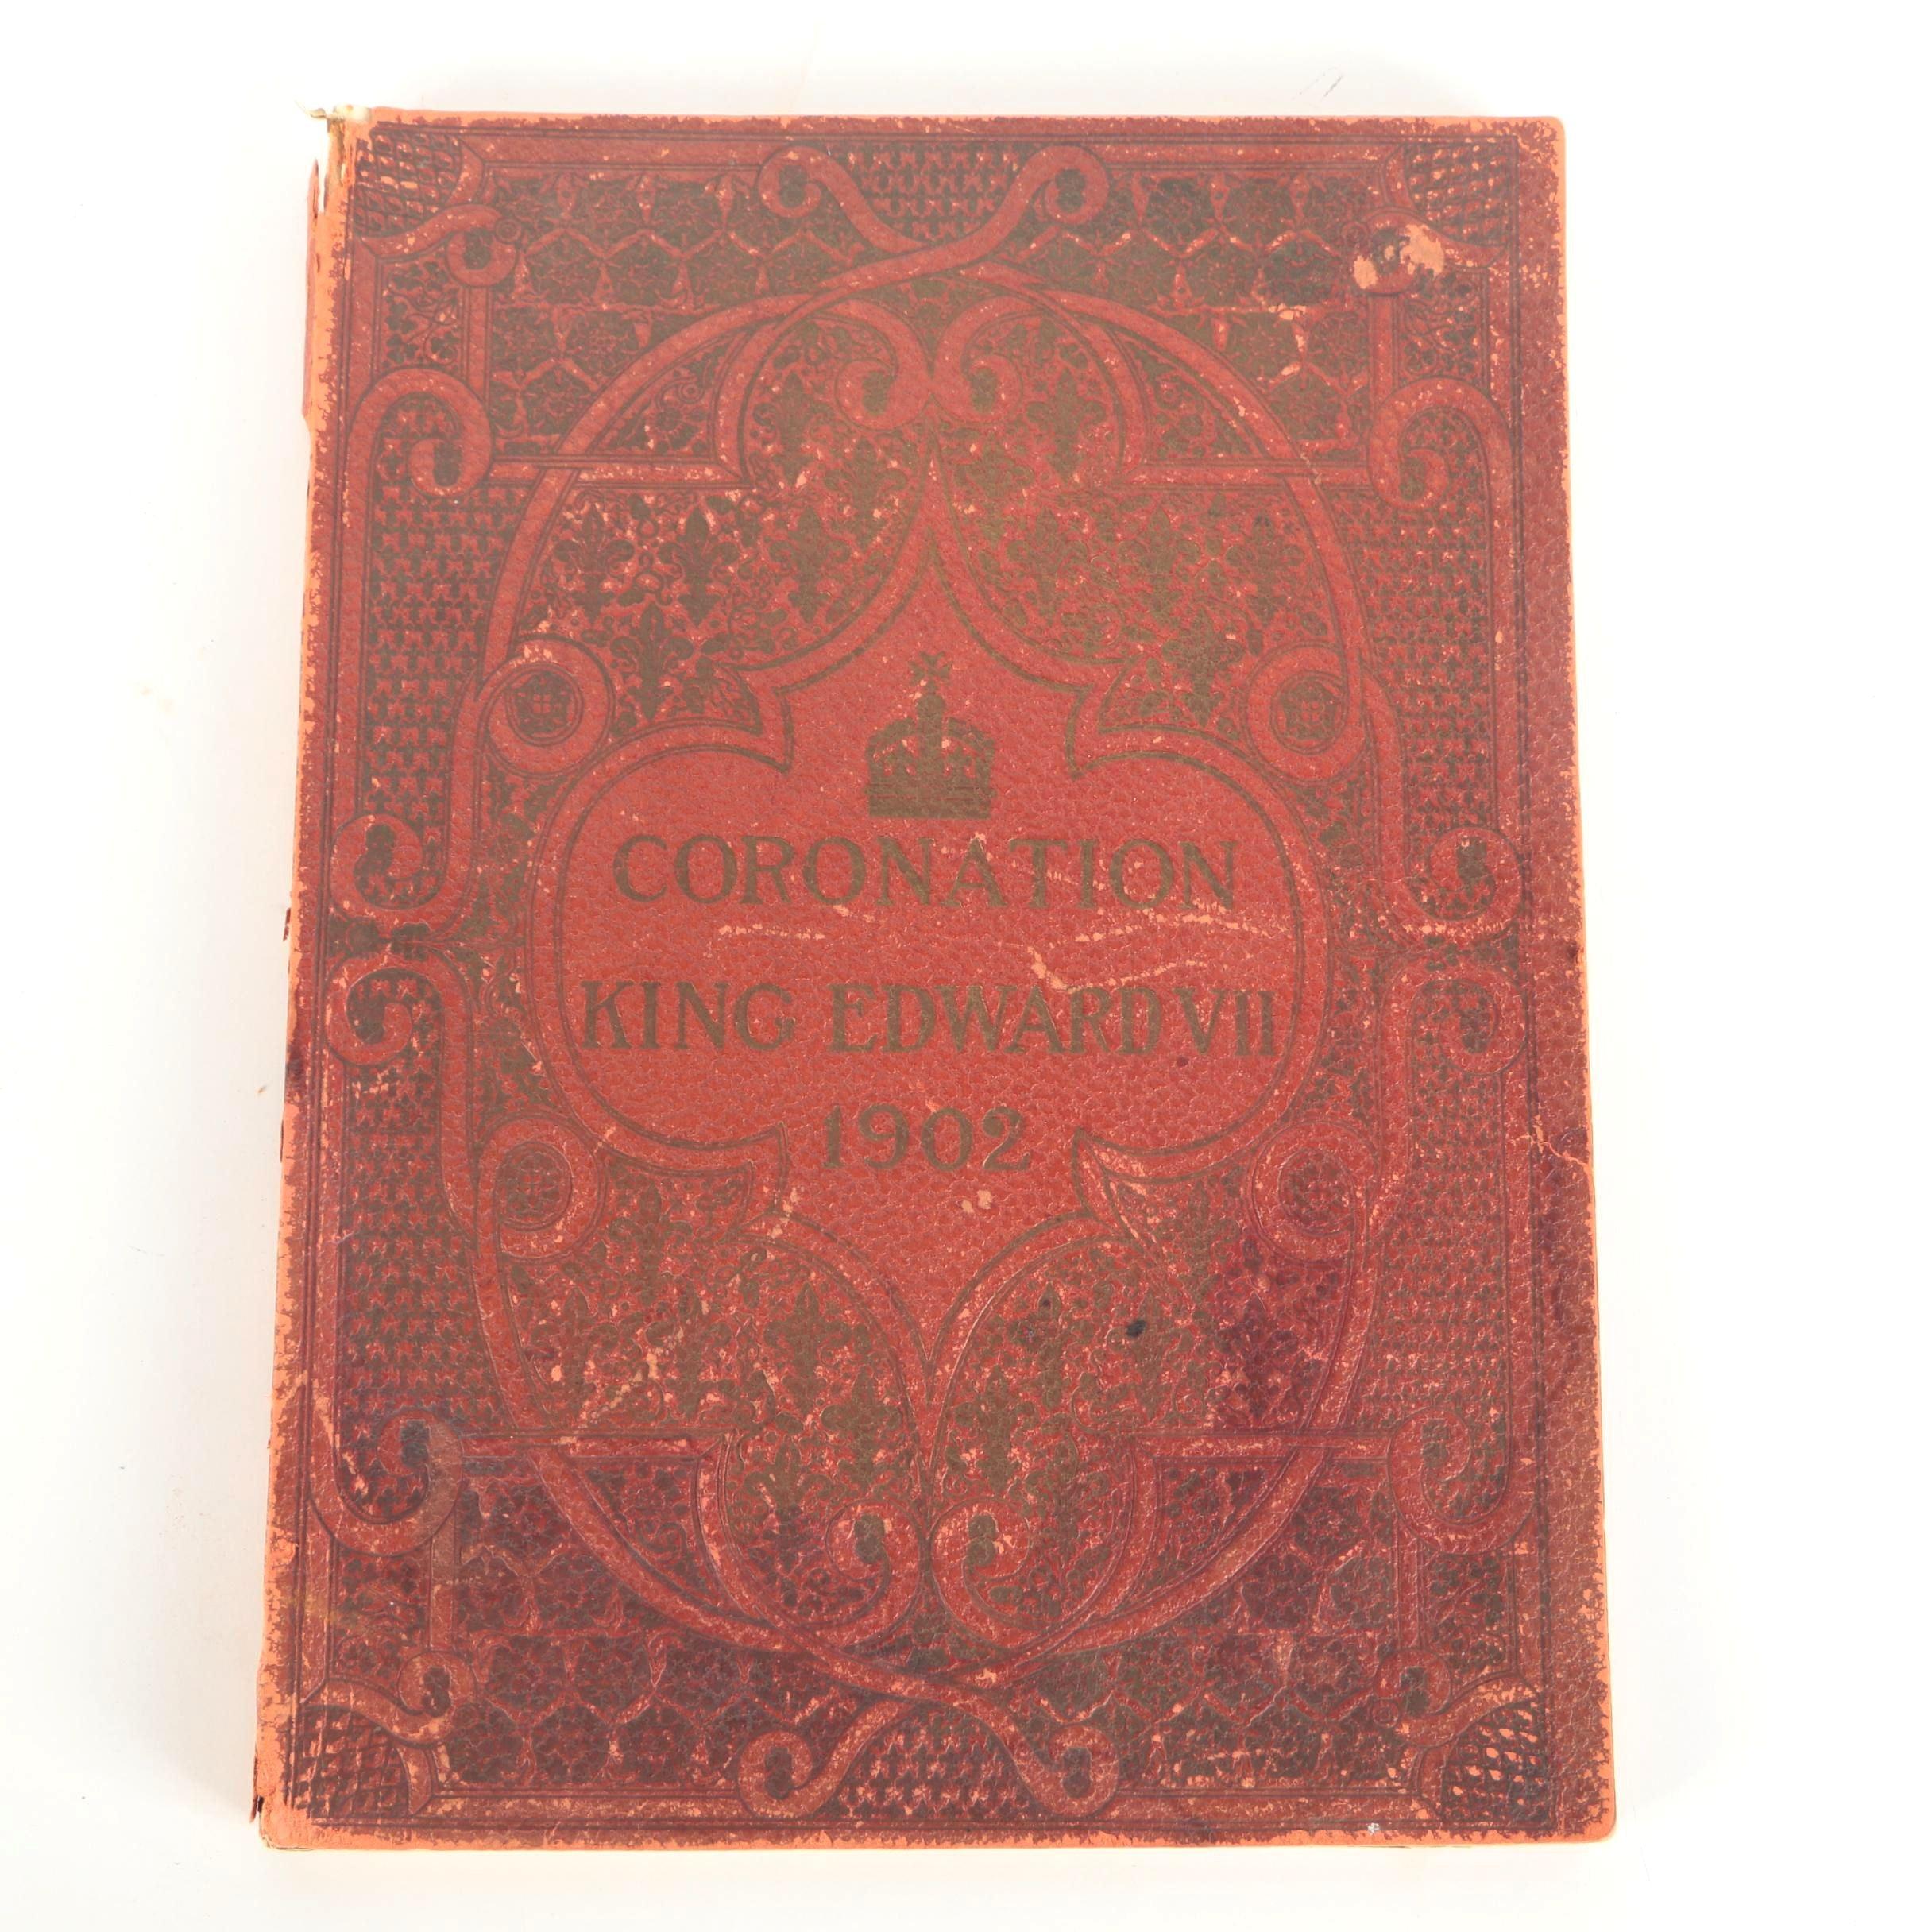 "Illustrated London News Coronation Record ""Coronation King Edward VII 1902"""